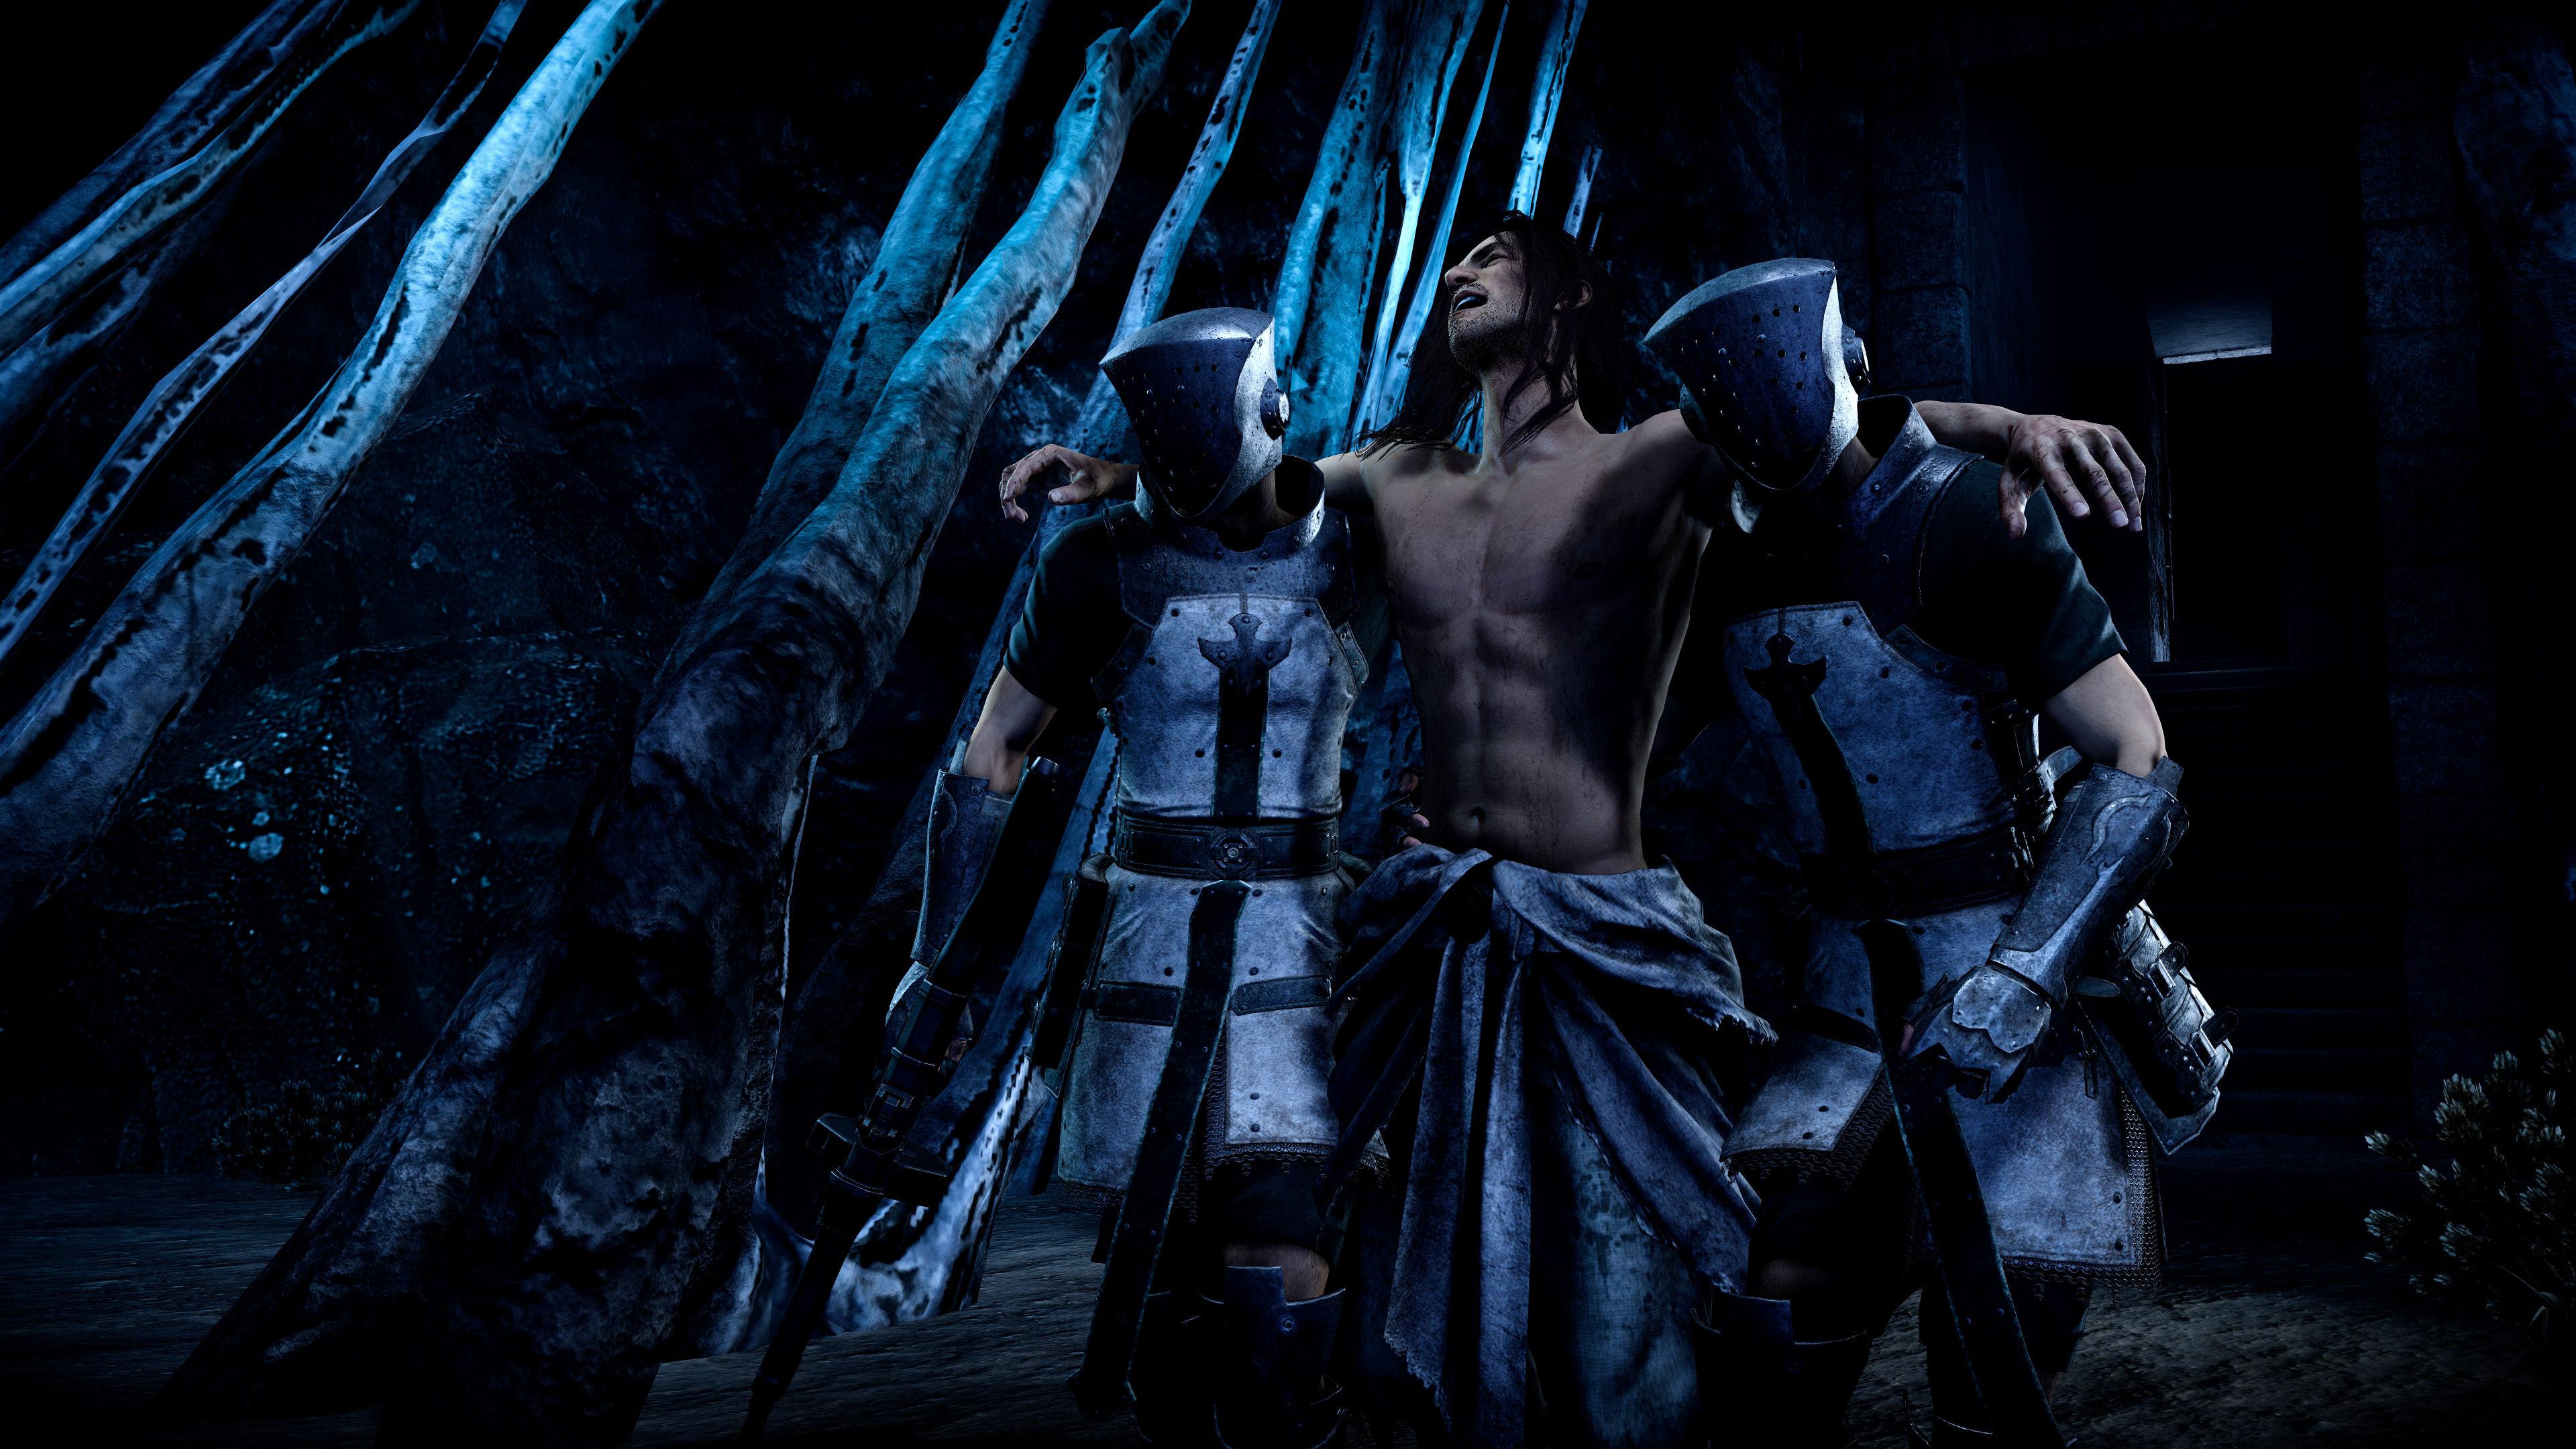 shirtless – Final Fantasy XV